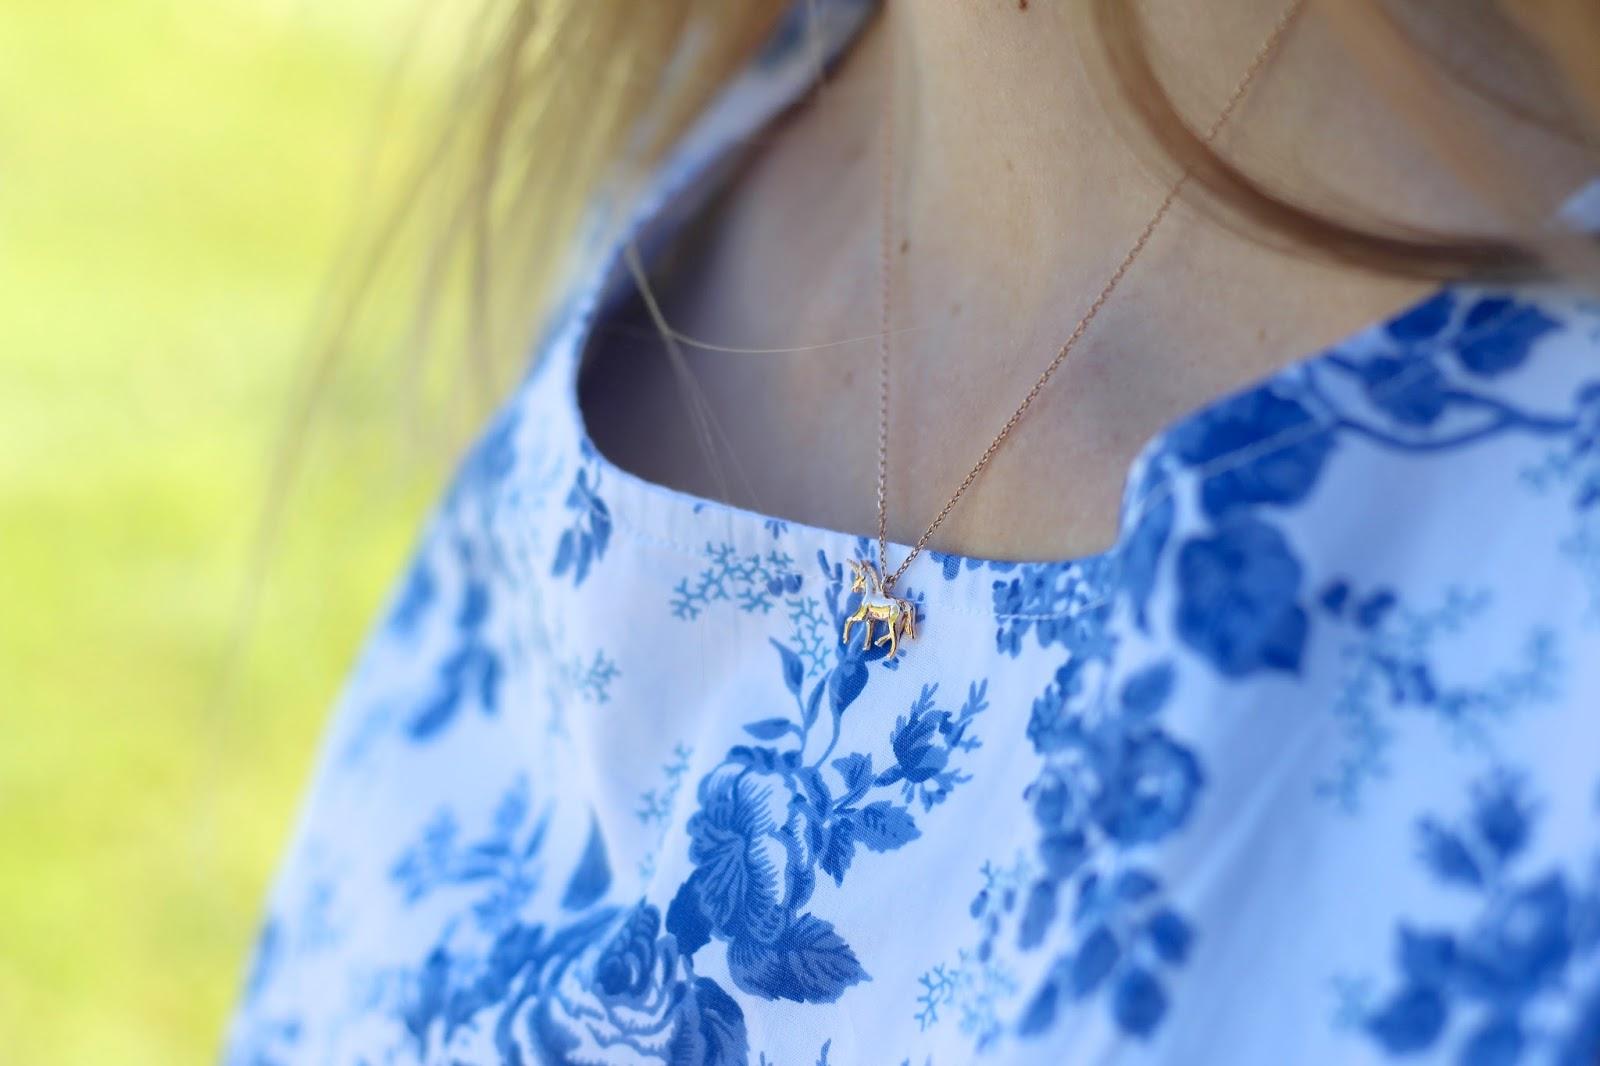 Estella Bartlett dainty unicorn necklace fashion blogger